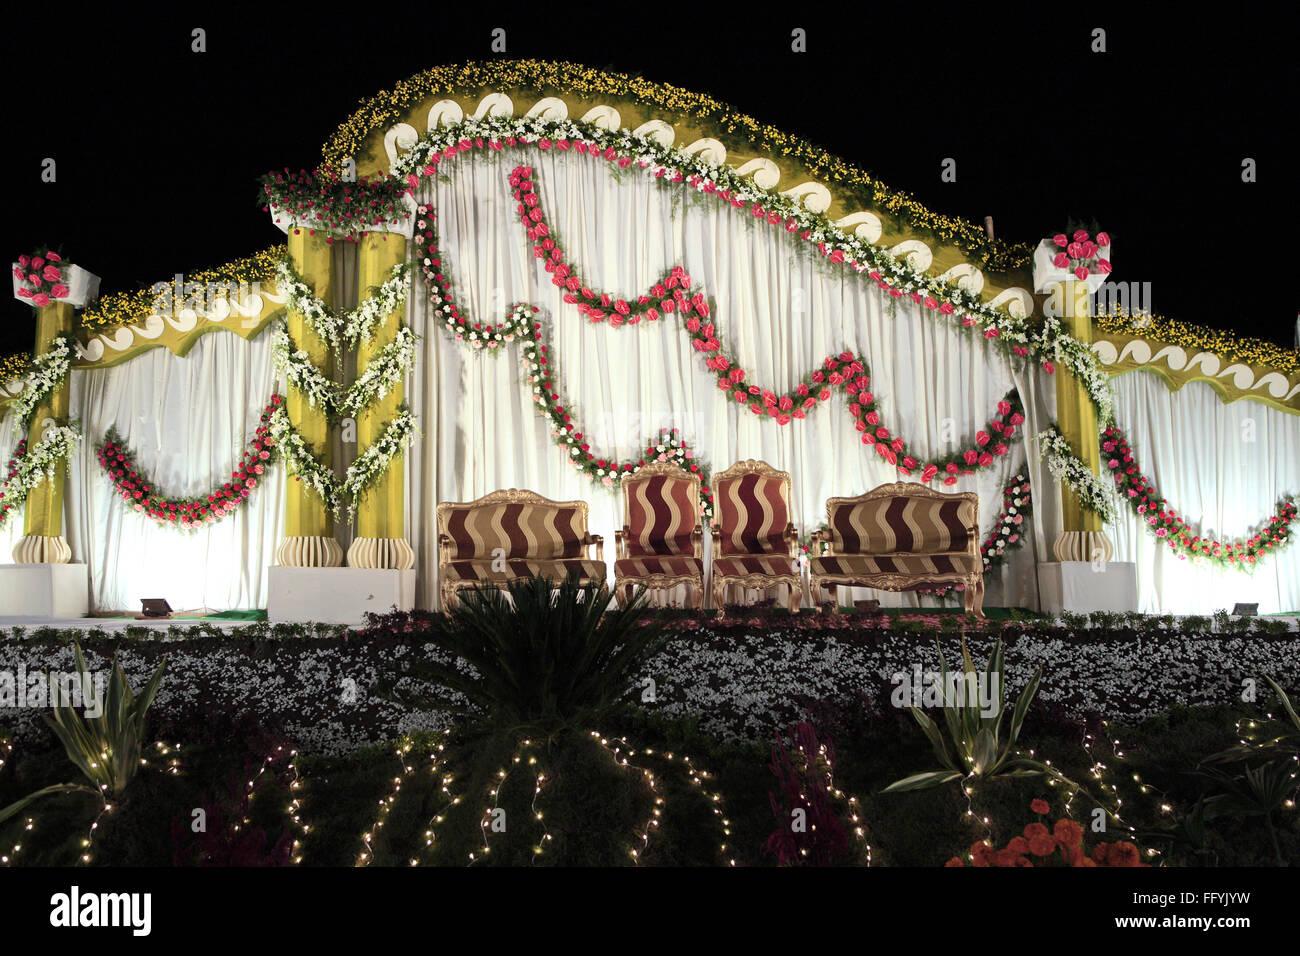 Indian Wedding Reception Decoration Flowers Stock Photos Indian